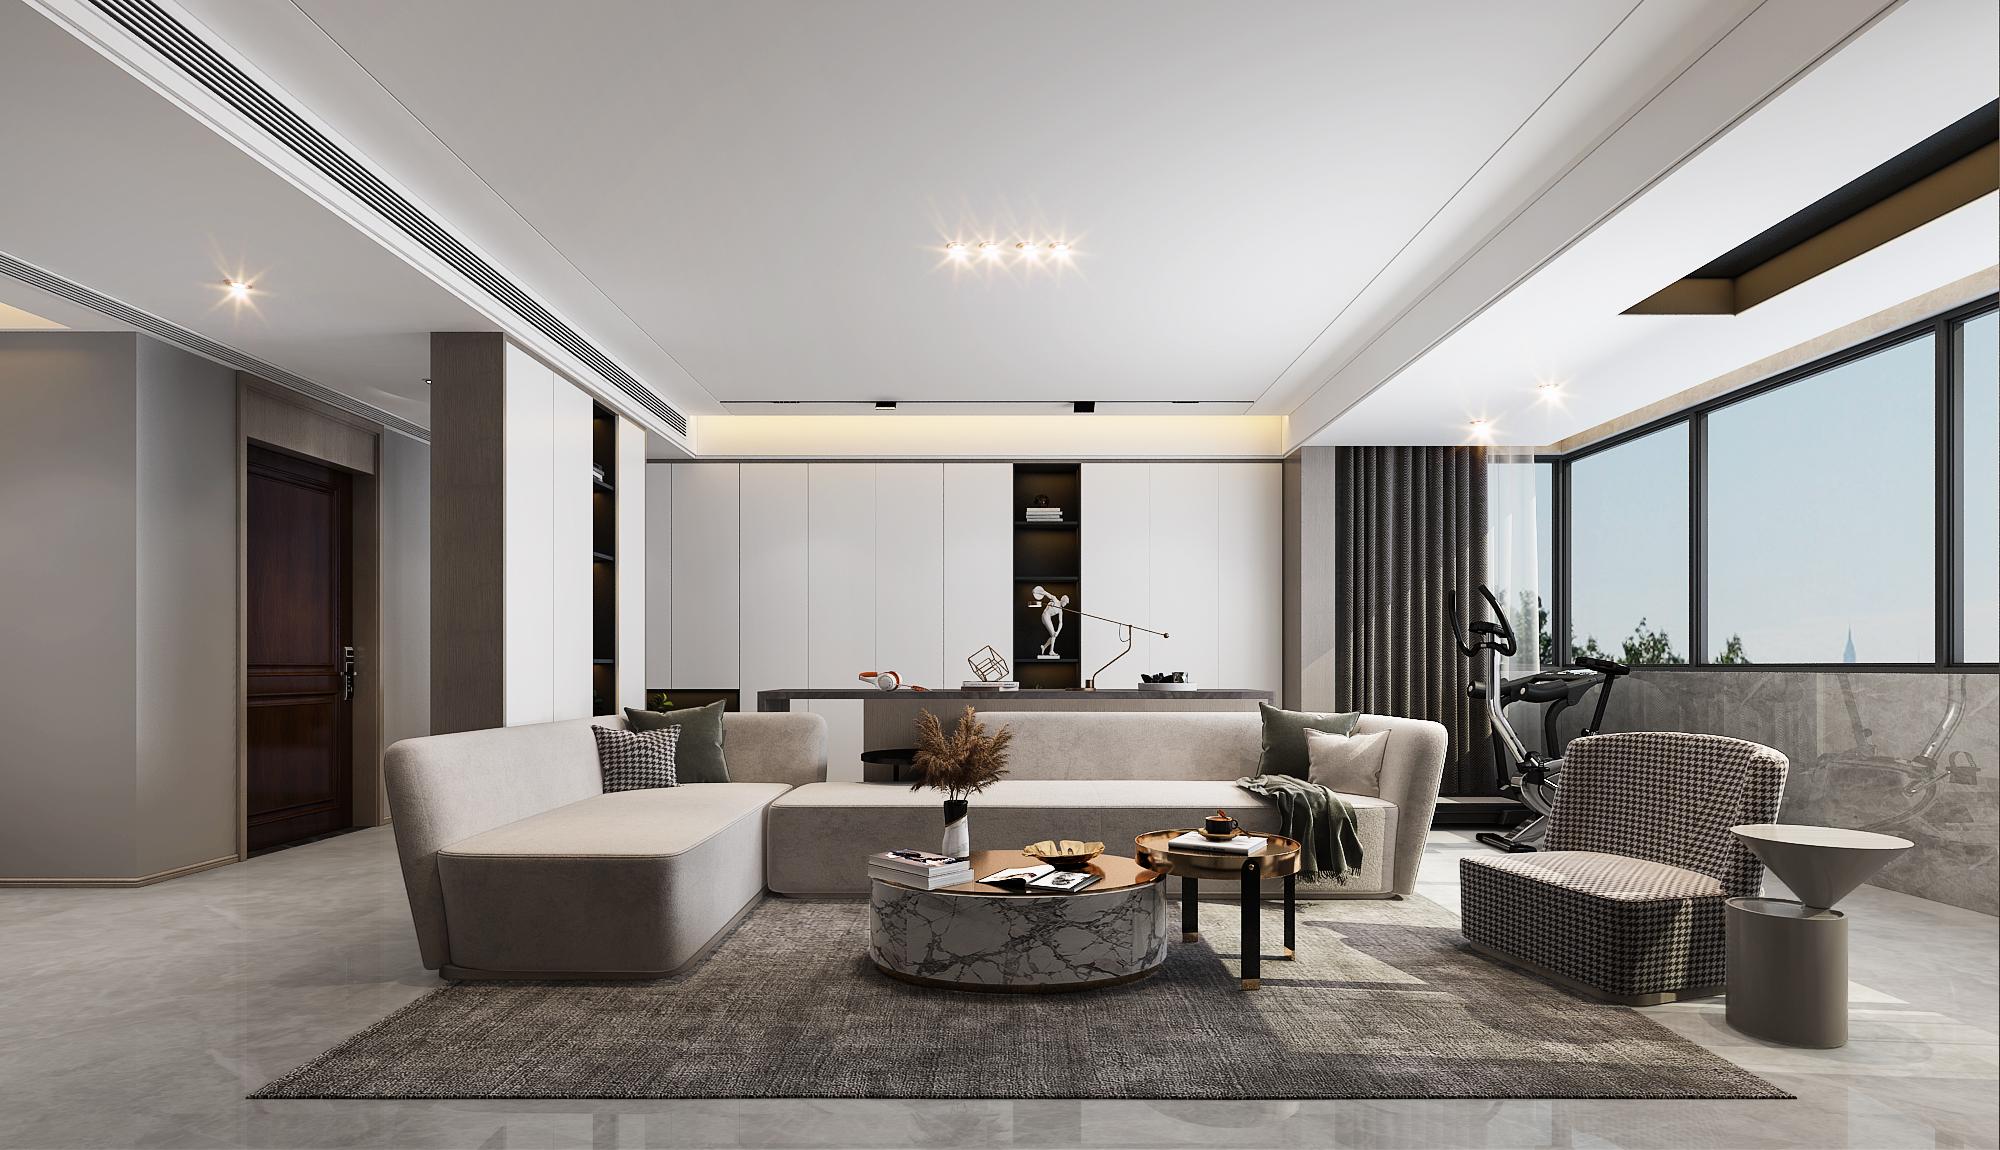 <span style='color: #ff0000'>现代风格</span>新房装修设计案例,客厅的布局可以借鉴